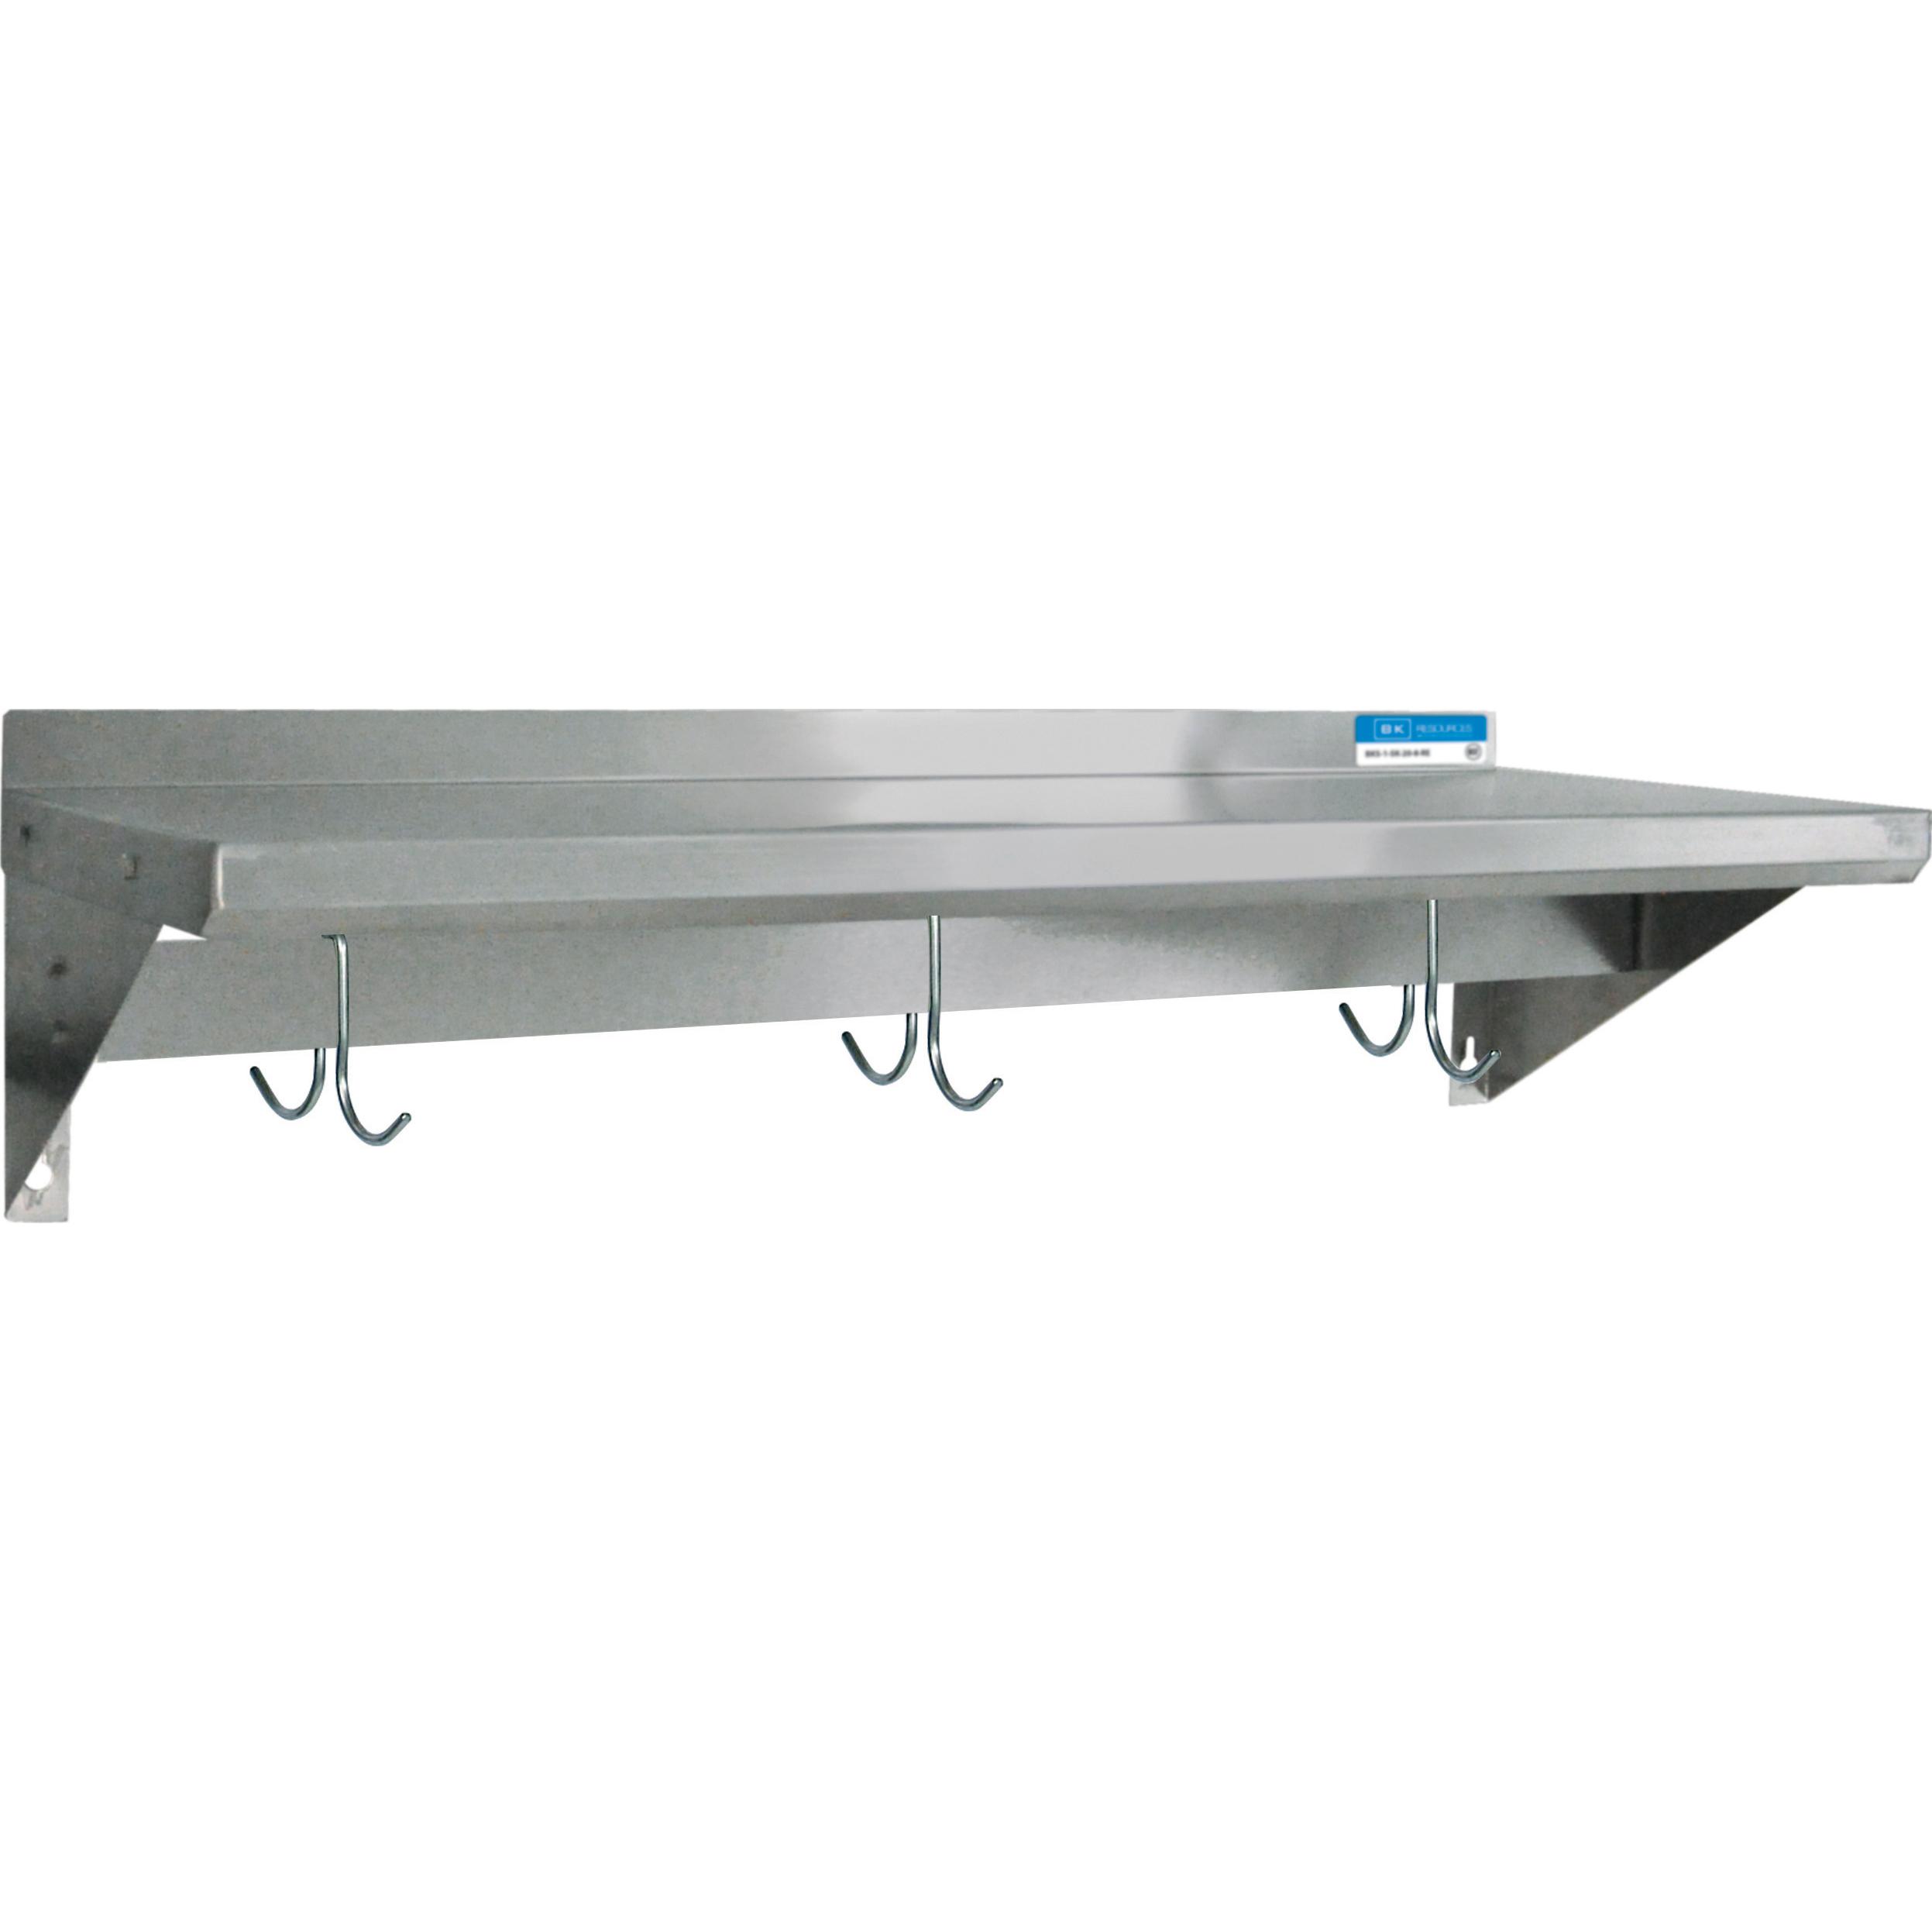 BK Resources BKWS6-1436-PR overshelf, wall-mounted with pot rack